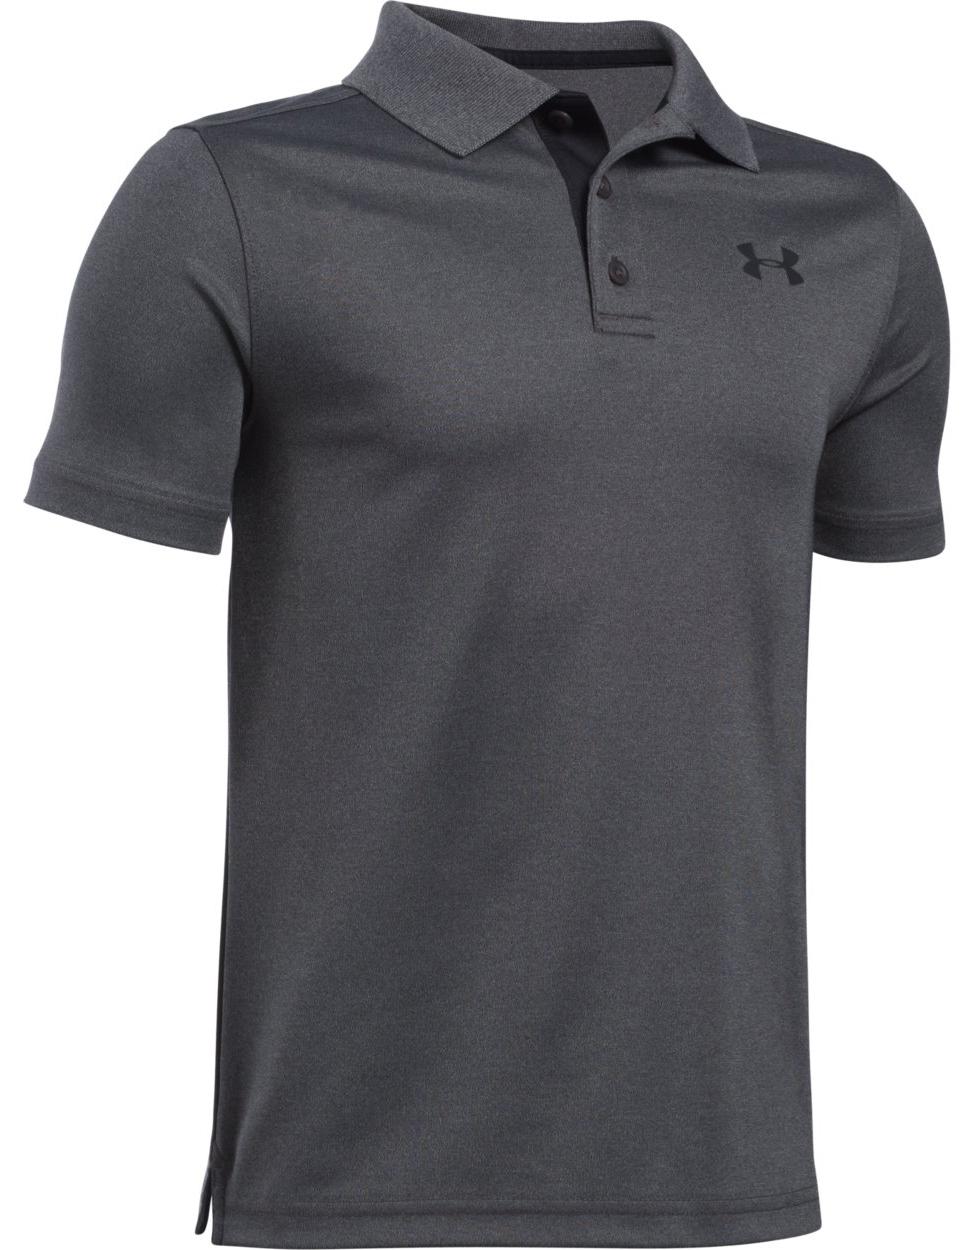 Under Armour Mens Performance Polo Soccer Shirt 1290341